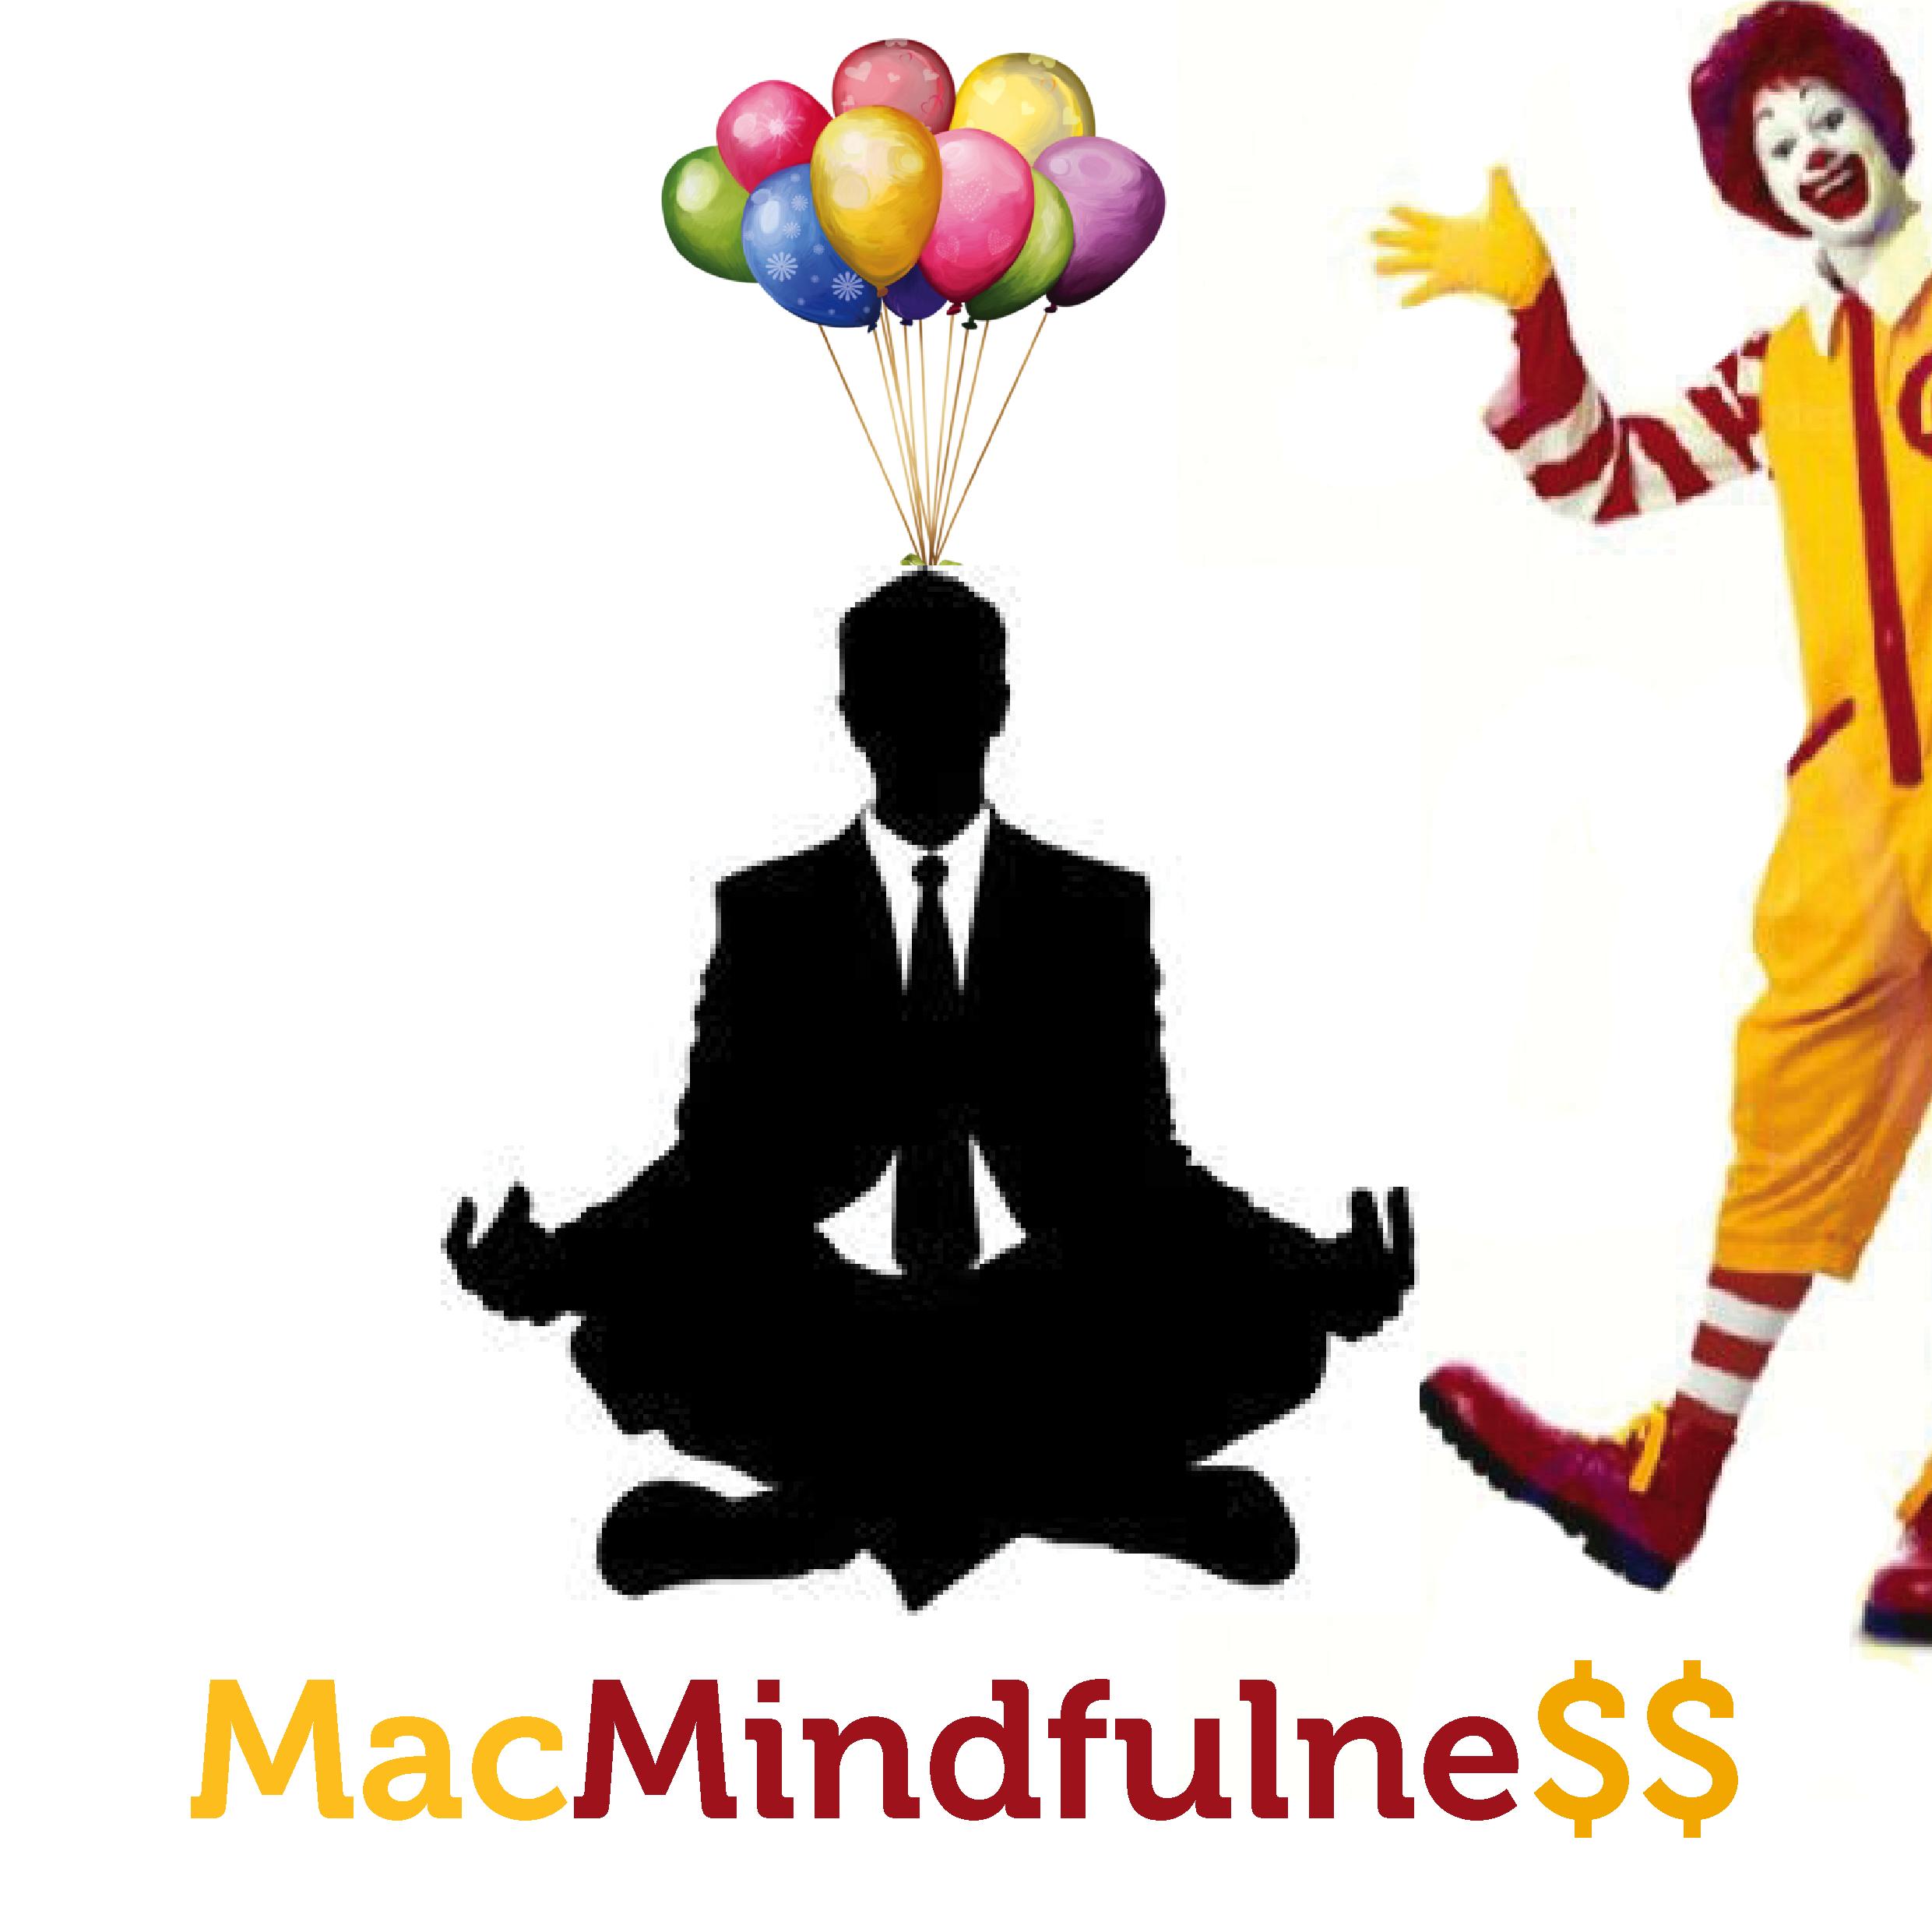 El capitalismo ha capturado el negocio del mindfulness. (*)